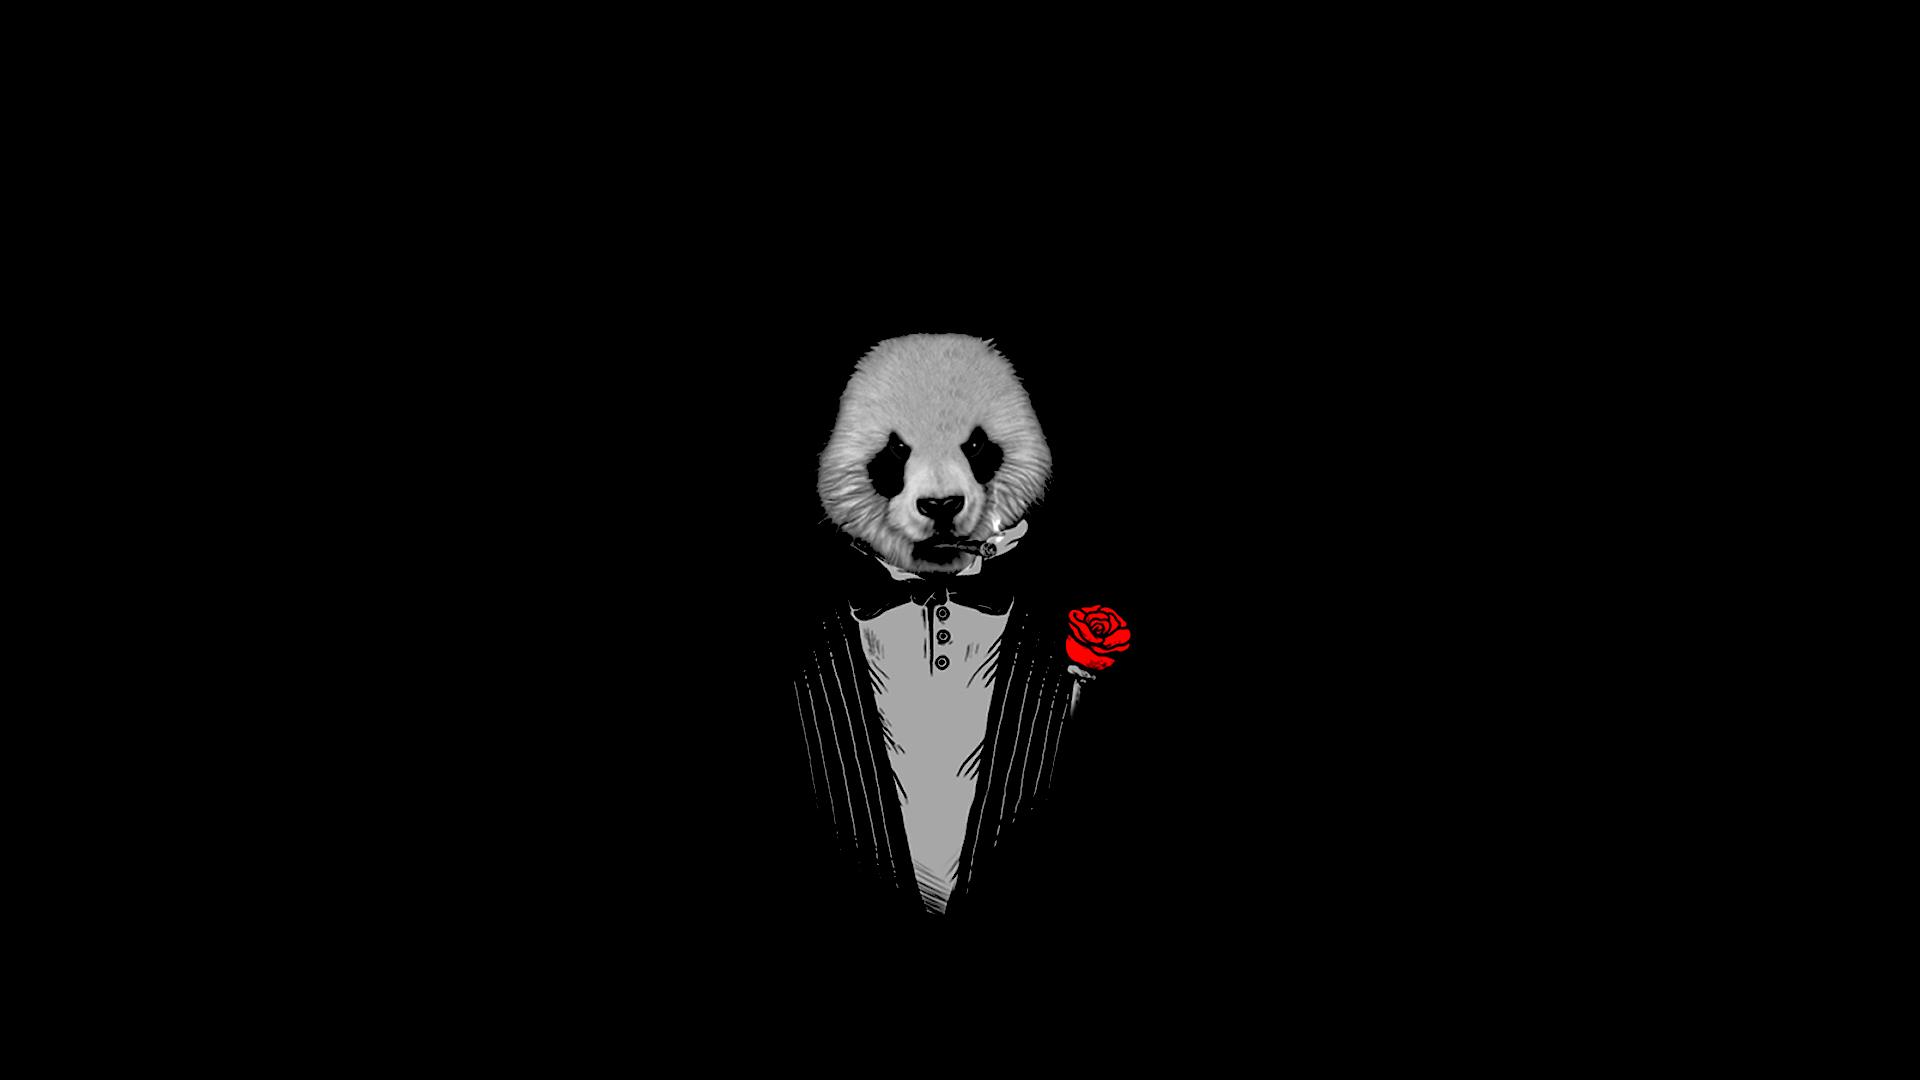 Panda The Godfather Black